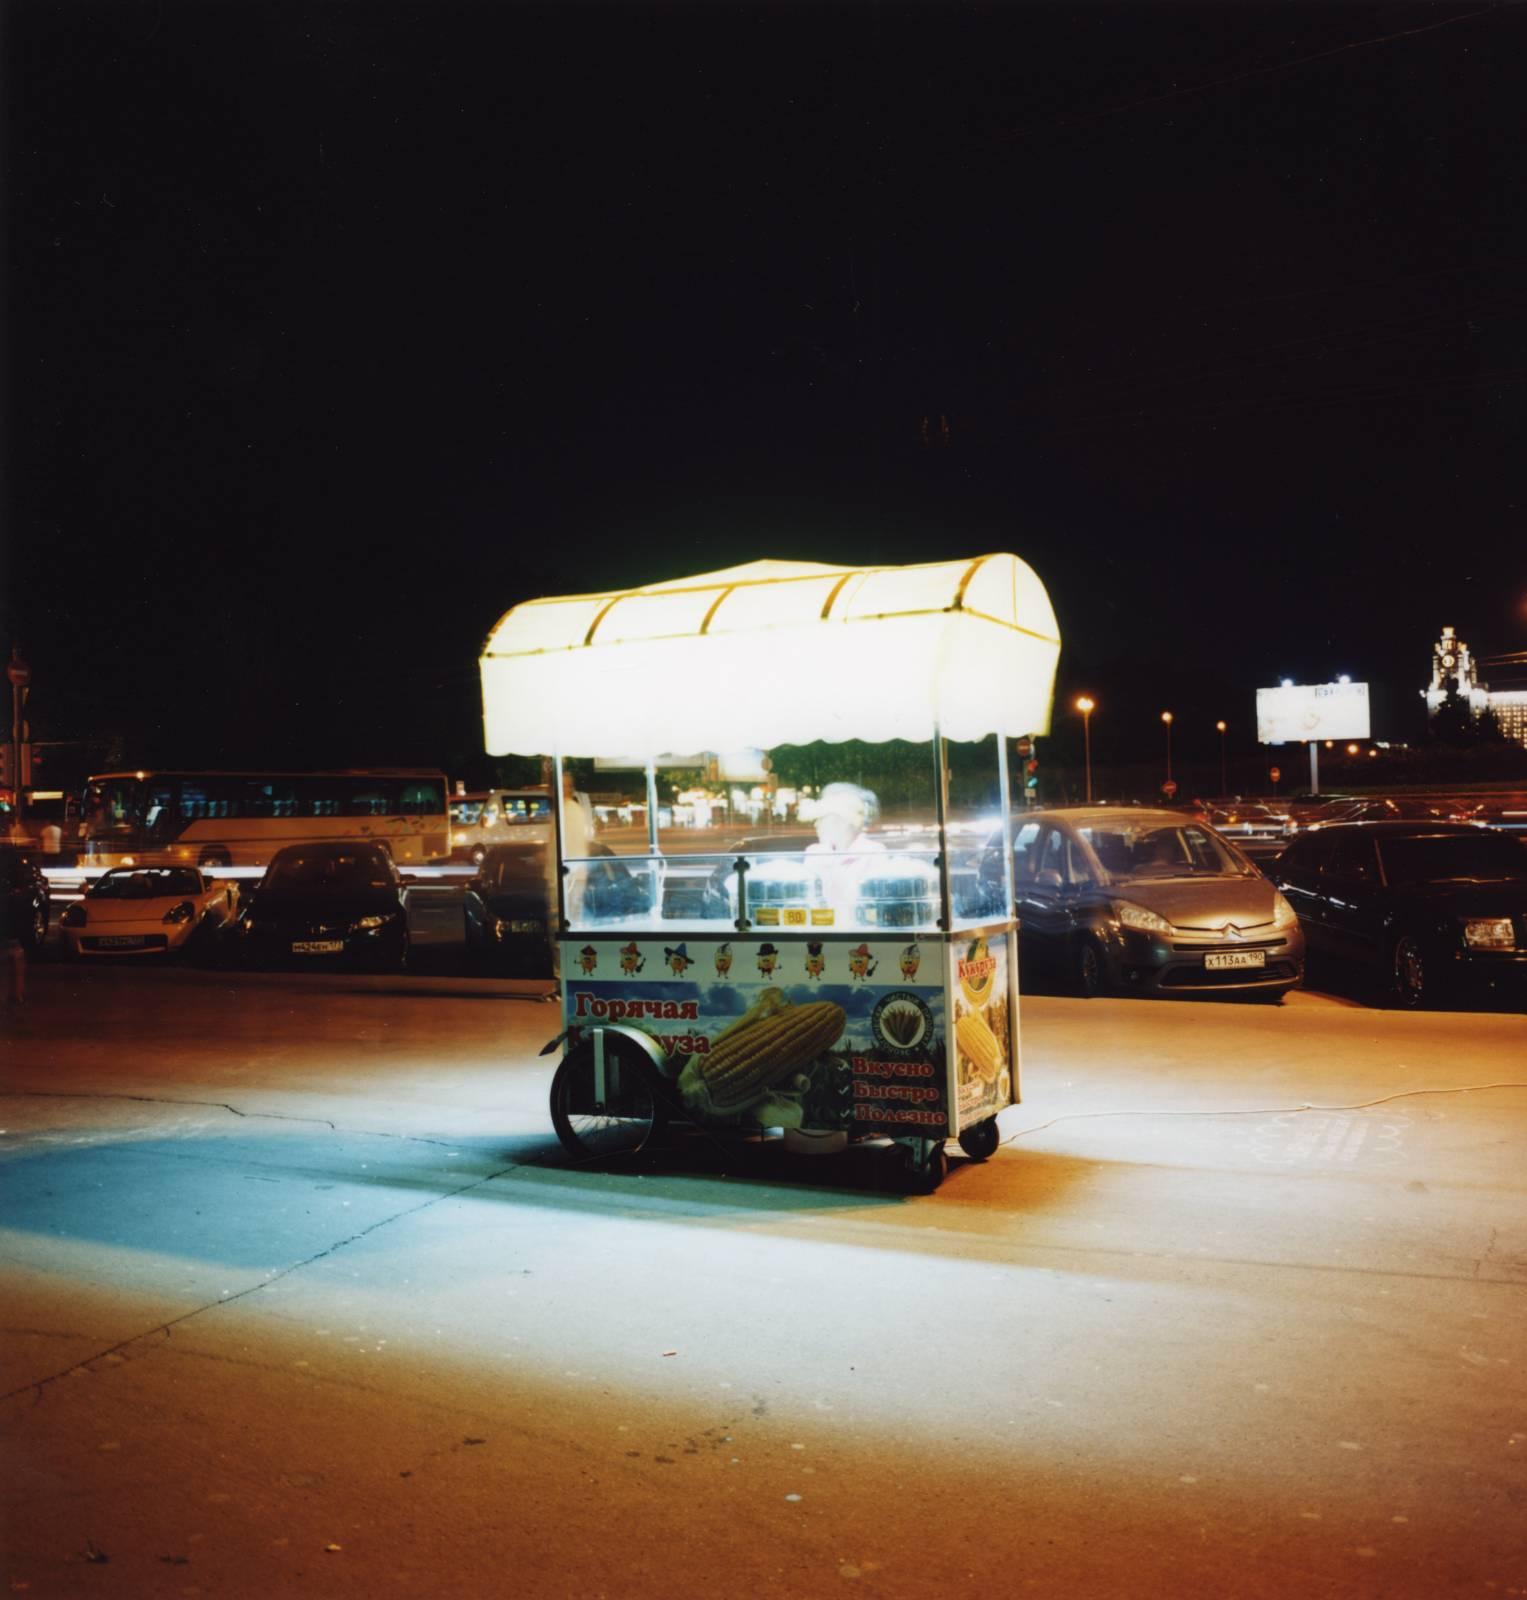 Wagon night, 2011, C-print, 80 x 80 cm